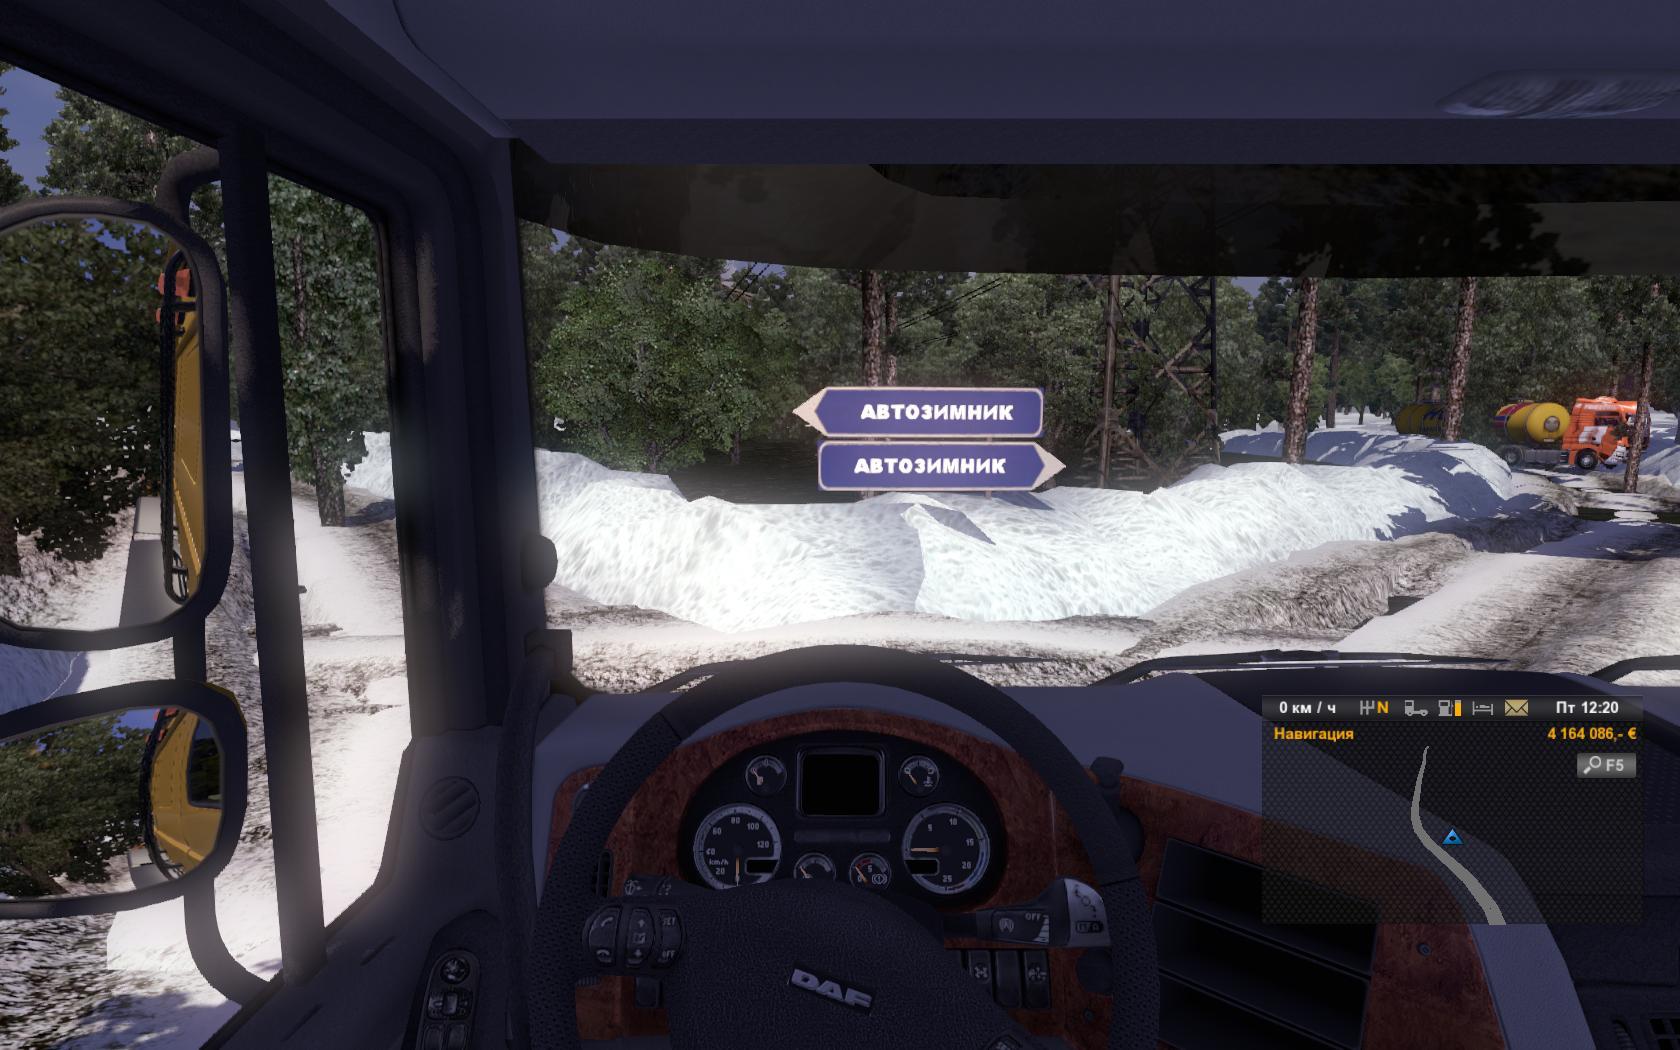 Truckers Map By Goba6372 R43 скачать торрент